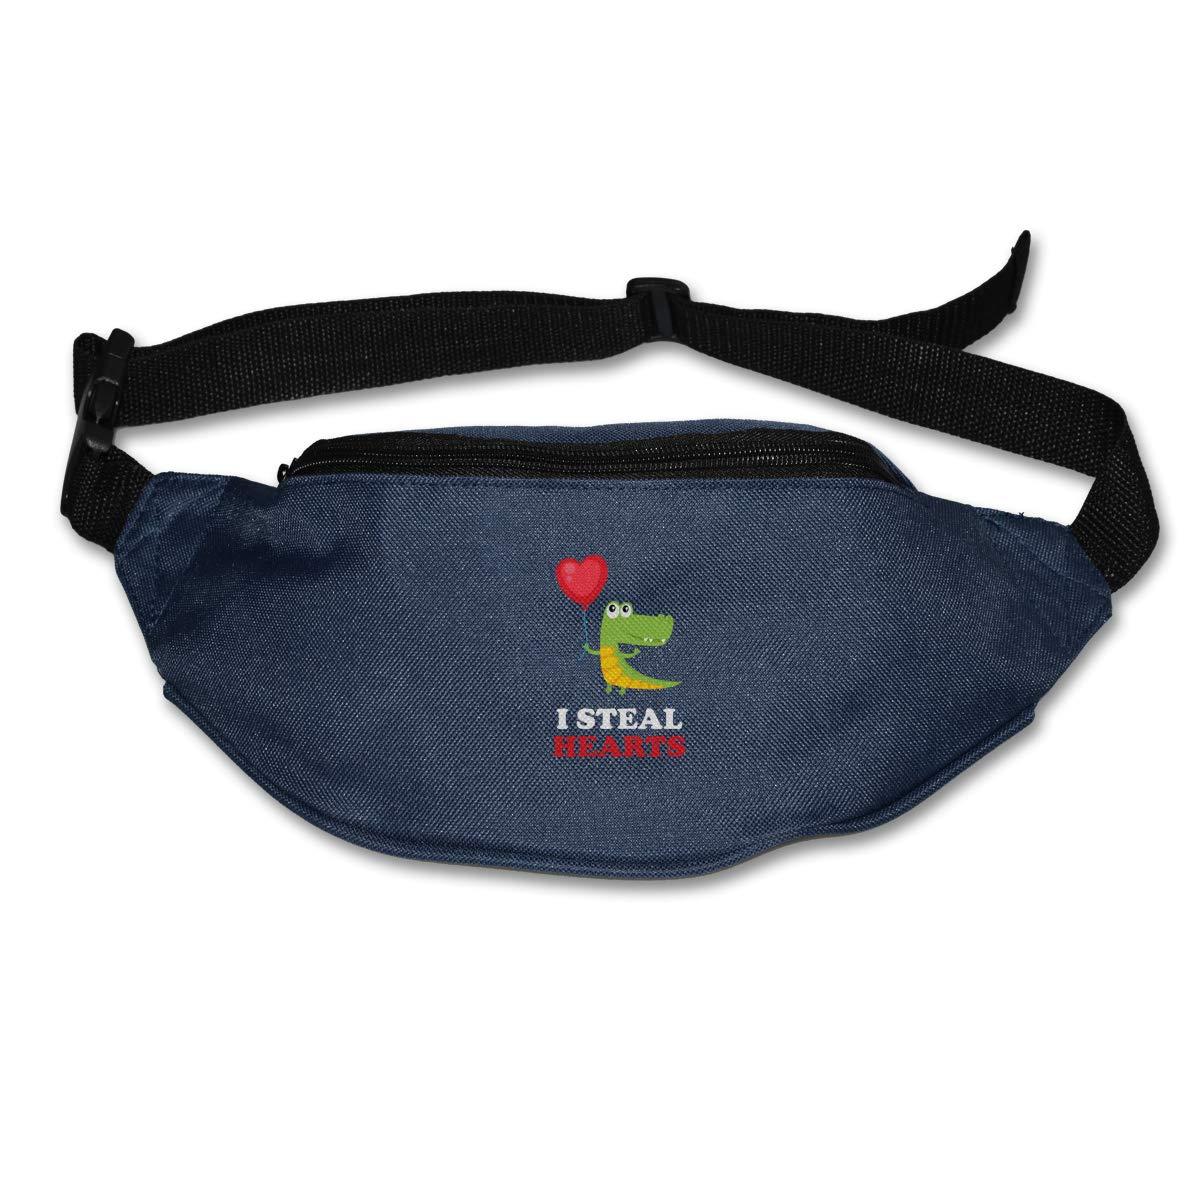 I Steal Hearts Sport Waist Pack Fanny Pack Adjustable For Hike